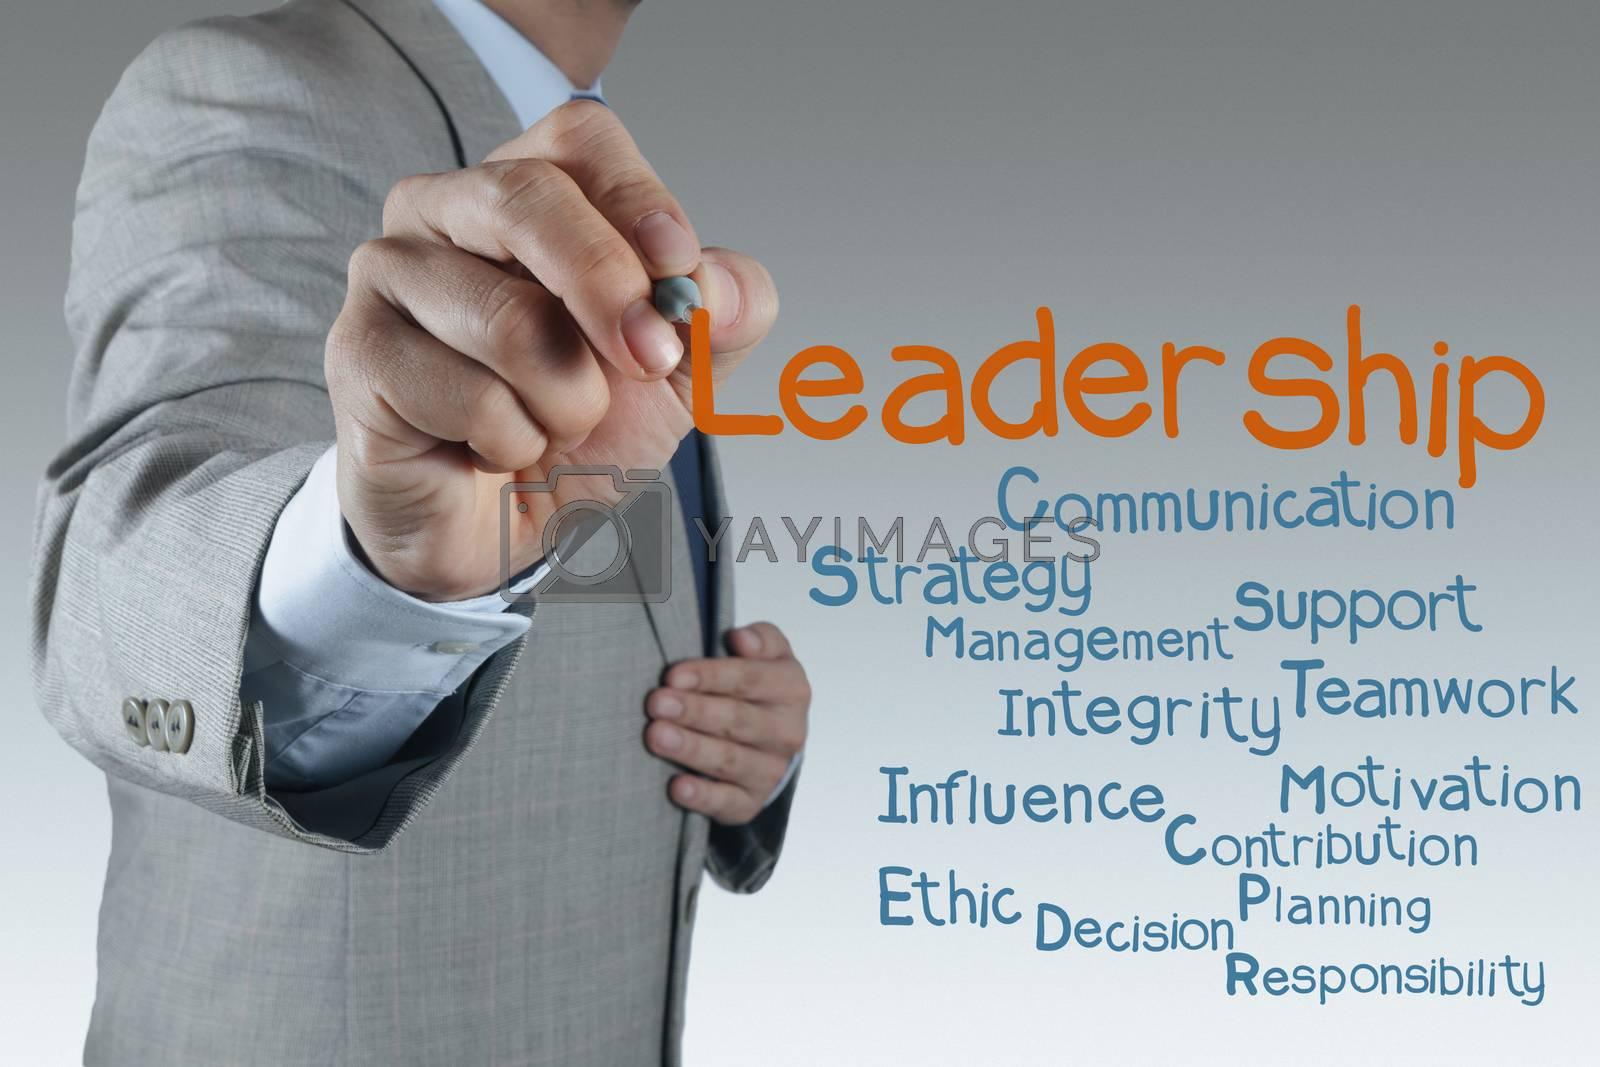 businessman hand shows light as leadership concept